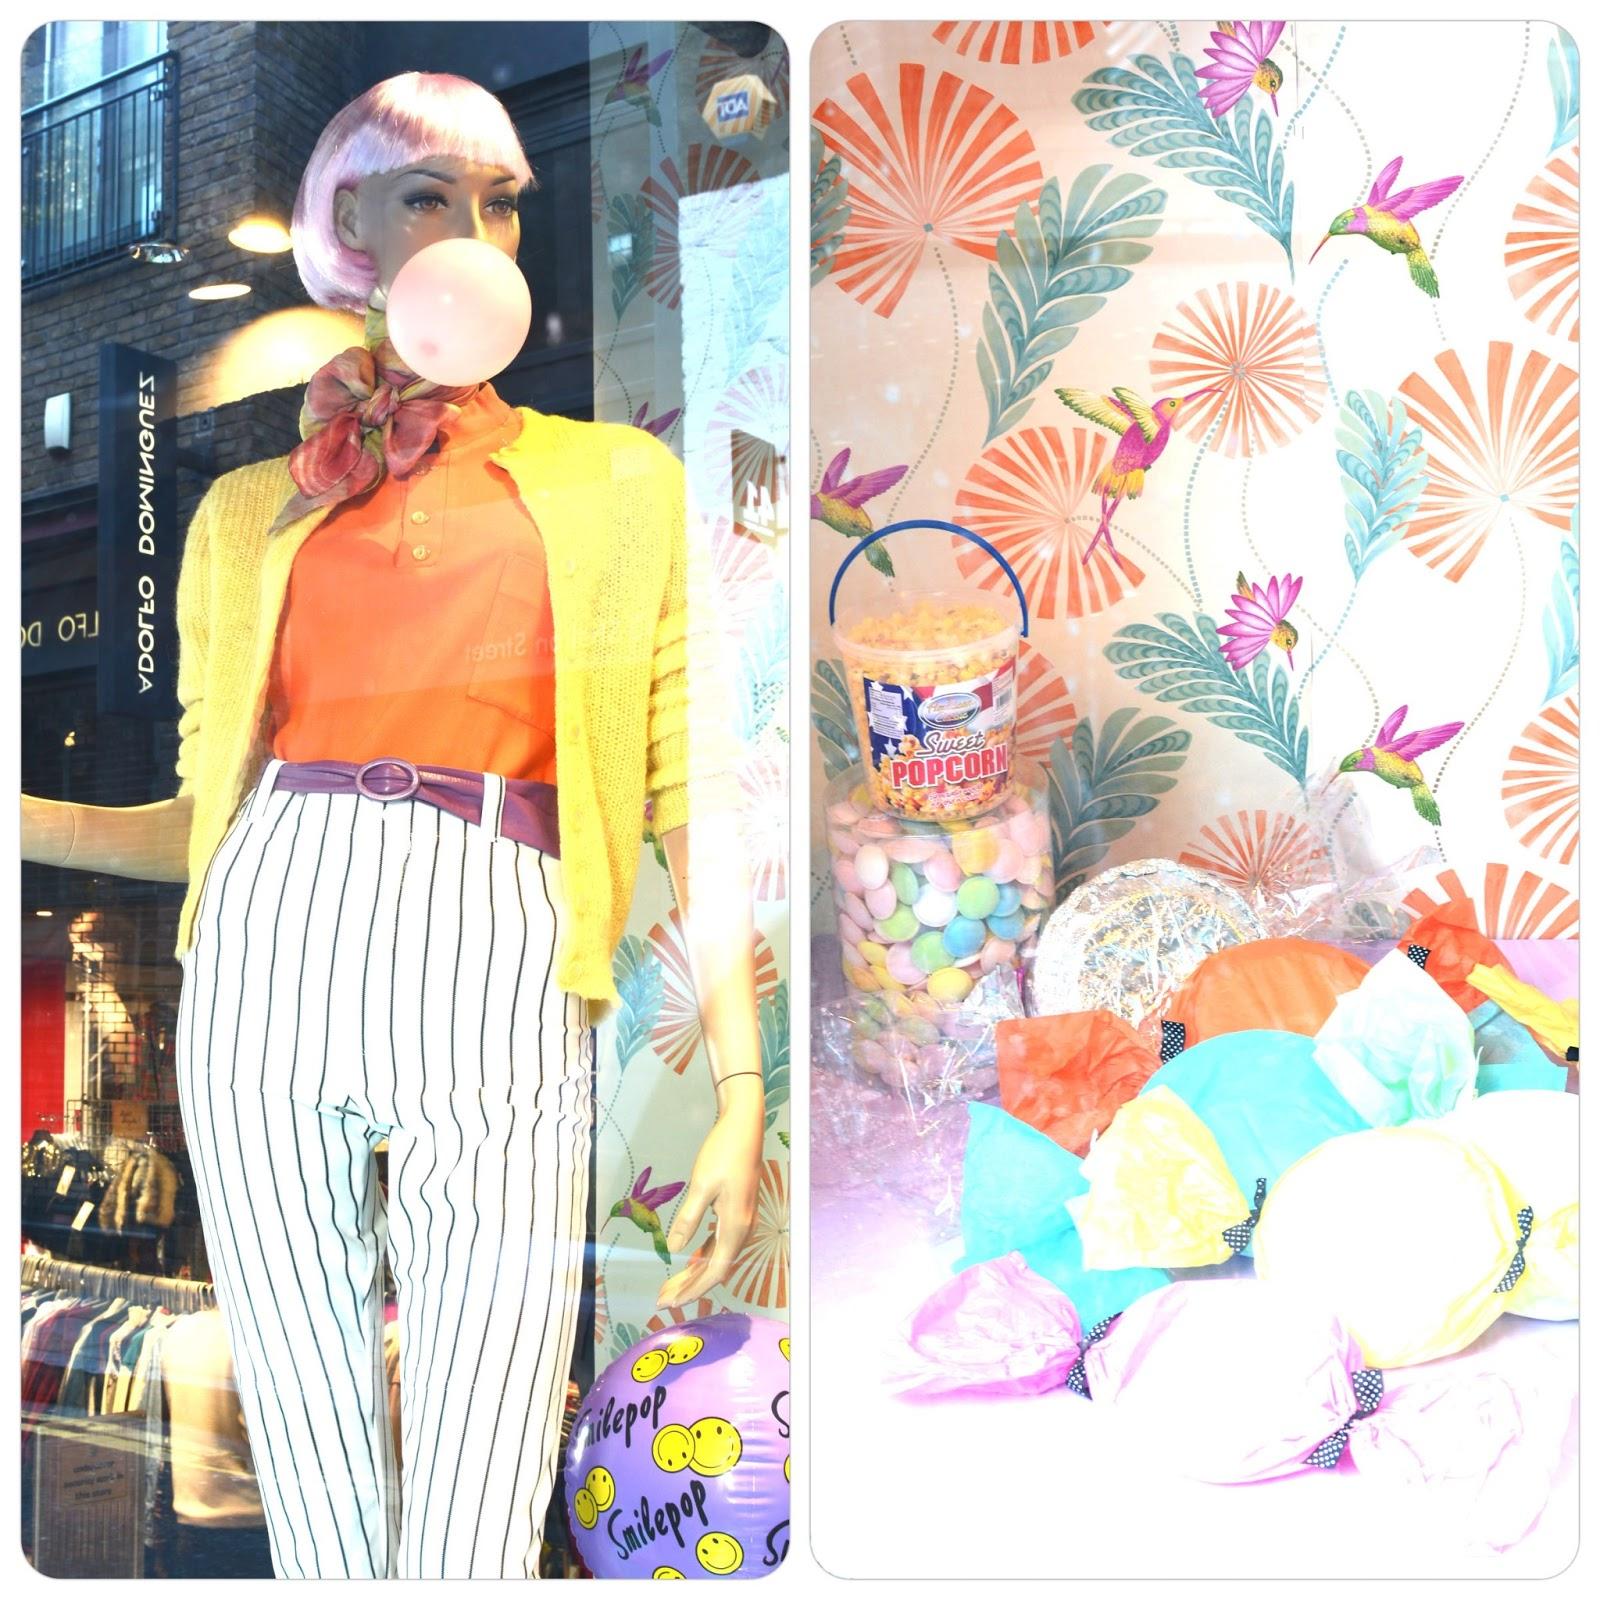 covent garden candyland rokit vintage clothing